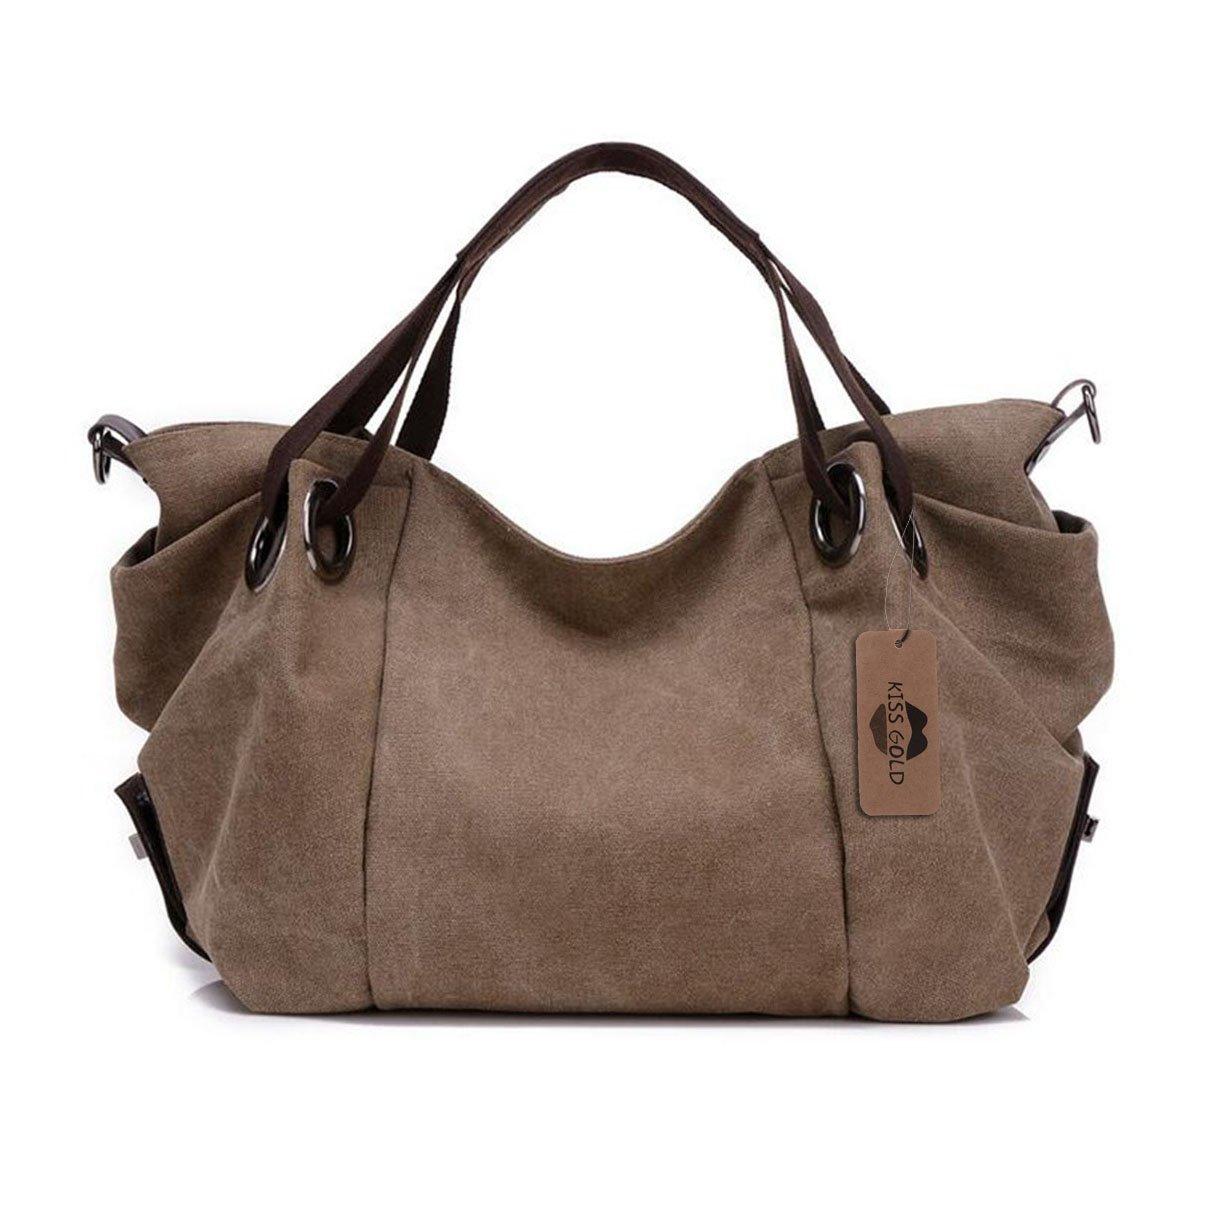 KISS GOLD(TM) Women's Canvas Hobo Top-handle Bag Crossbody Shoulder Bag, European Style, Large Size 16''X6.8''X12'', Coffee